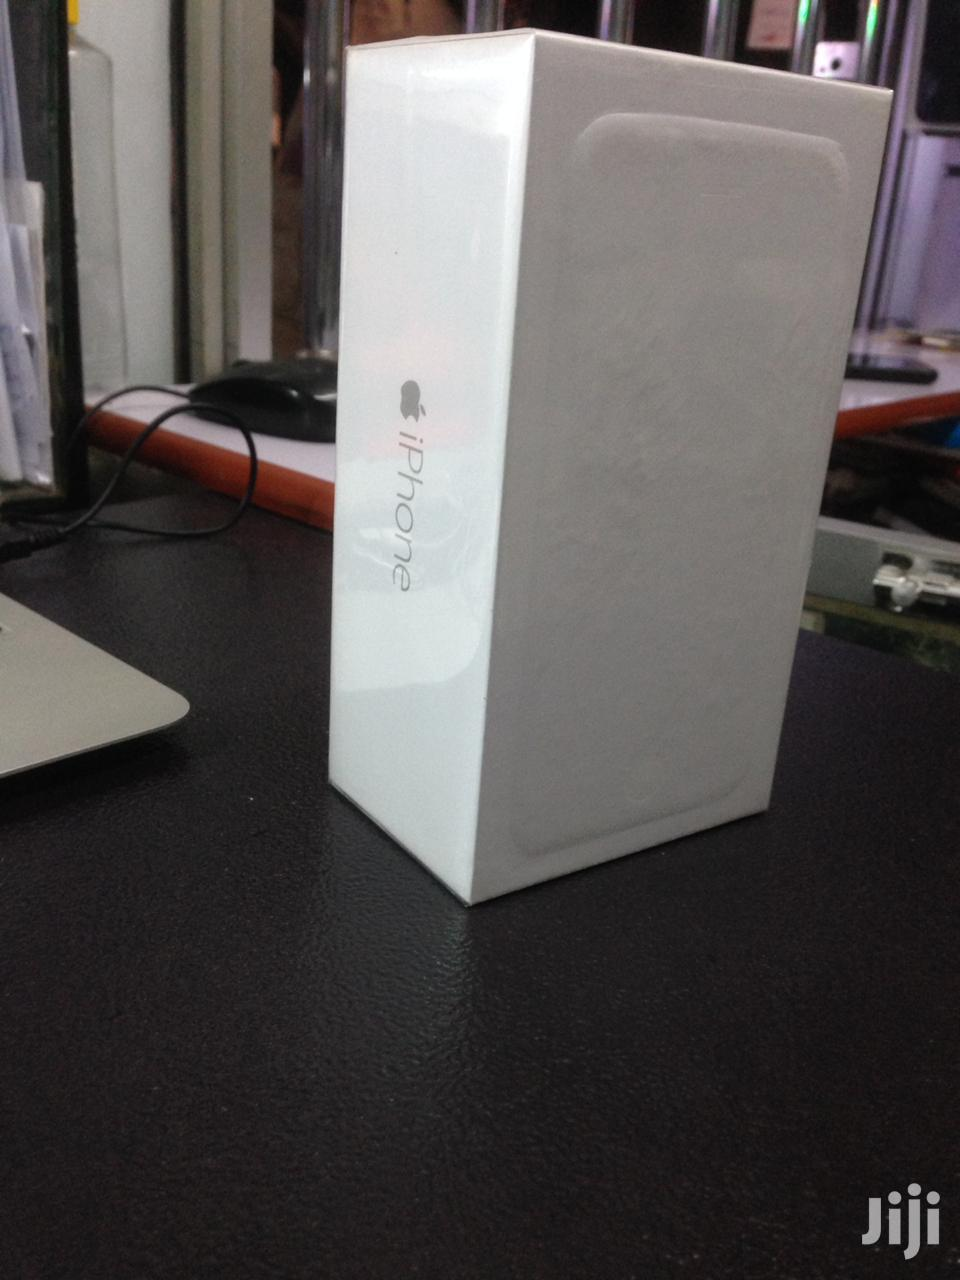 New Apple iPhone 6 64 GB Silver | Mobile Phones for sale in Nairobi Central, Nairobi, Kenya